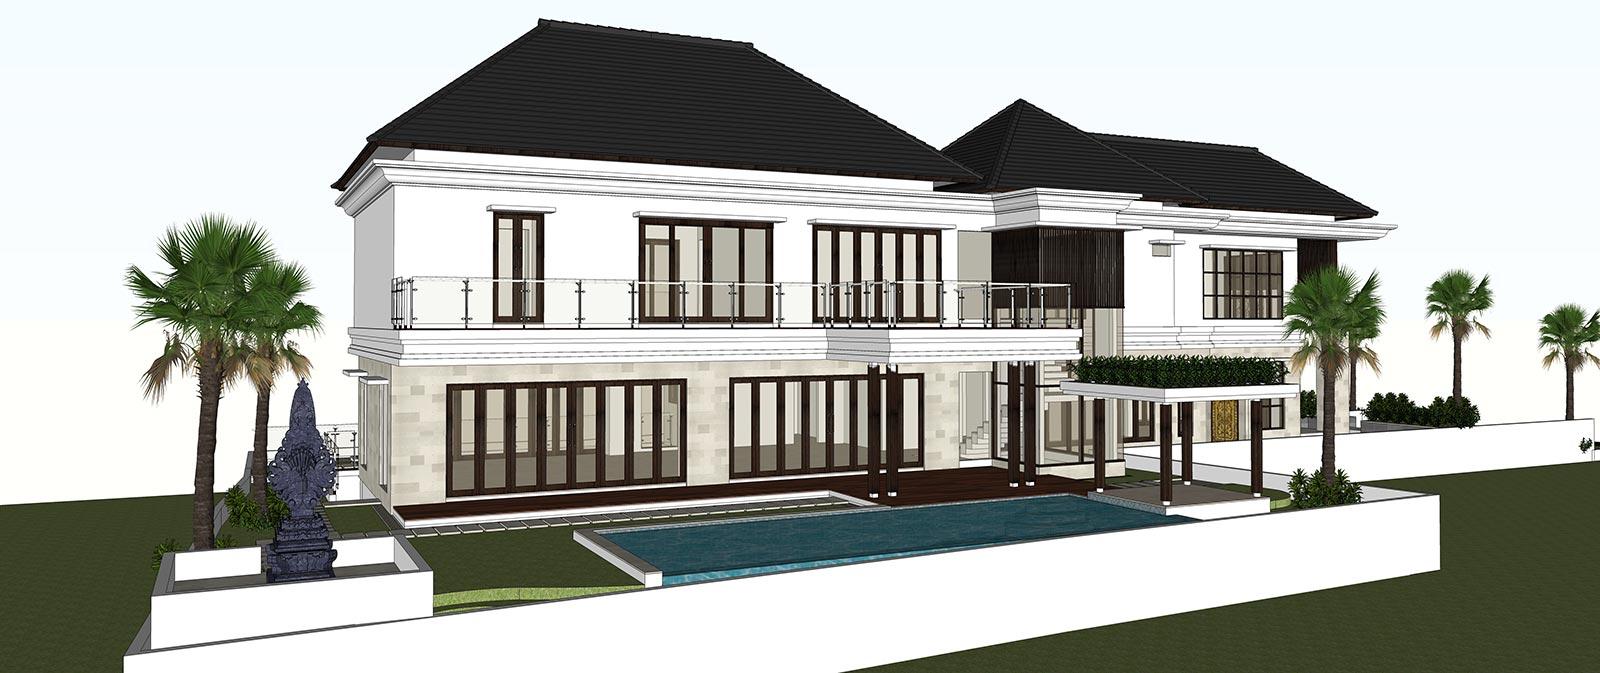 Jasa Arsitek Konsep Modeling 3D